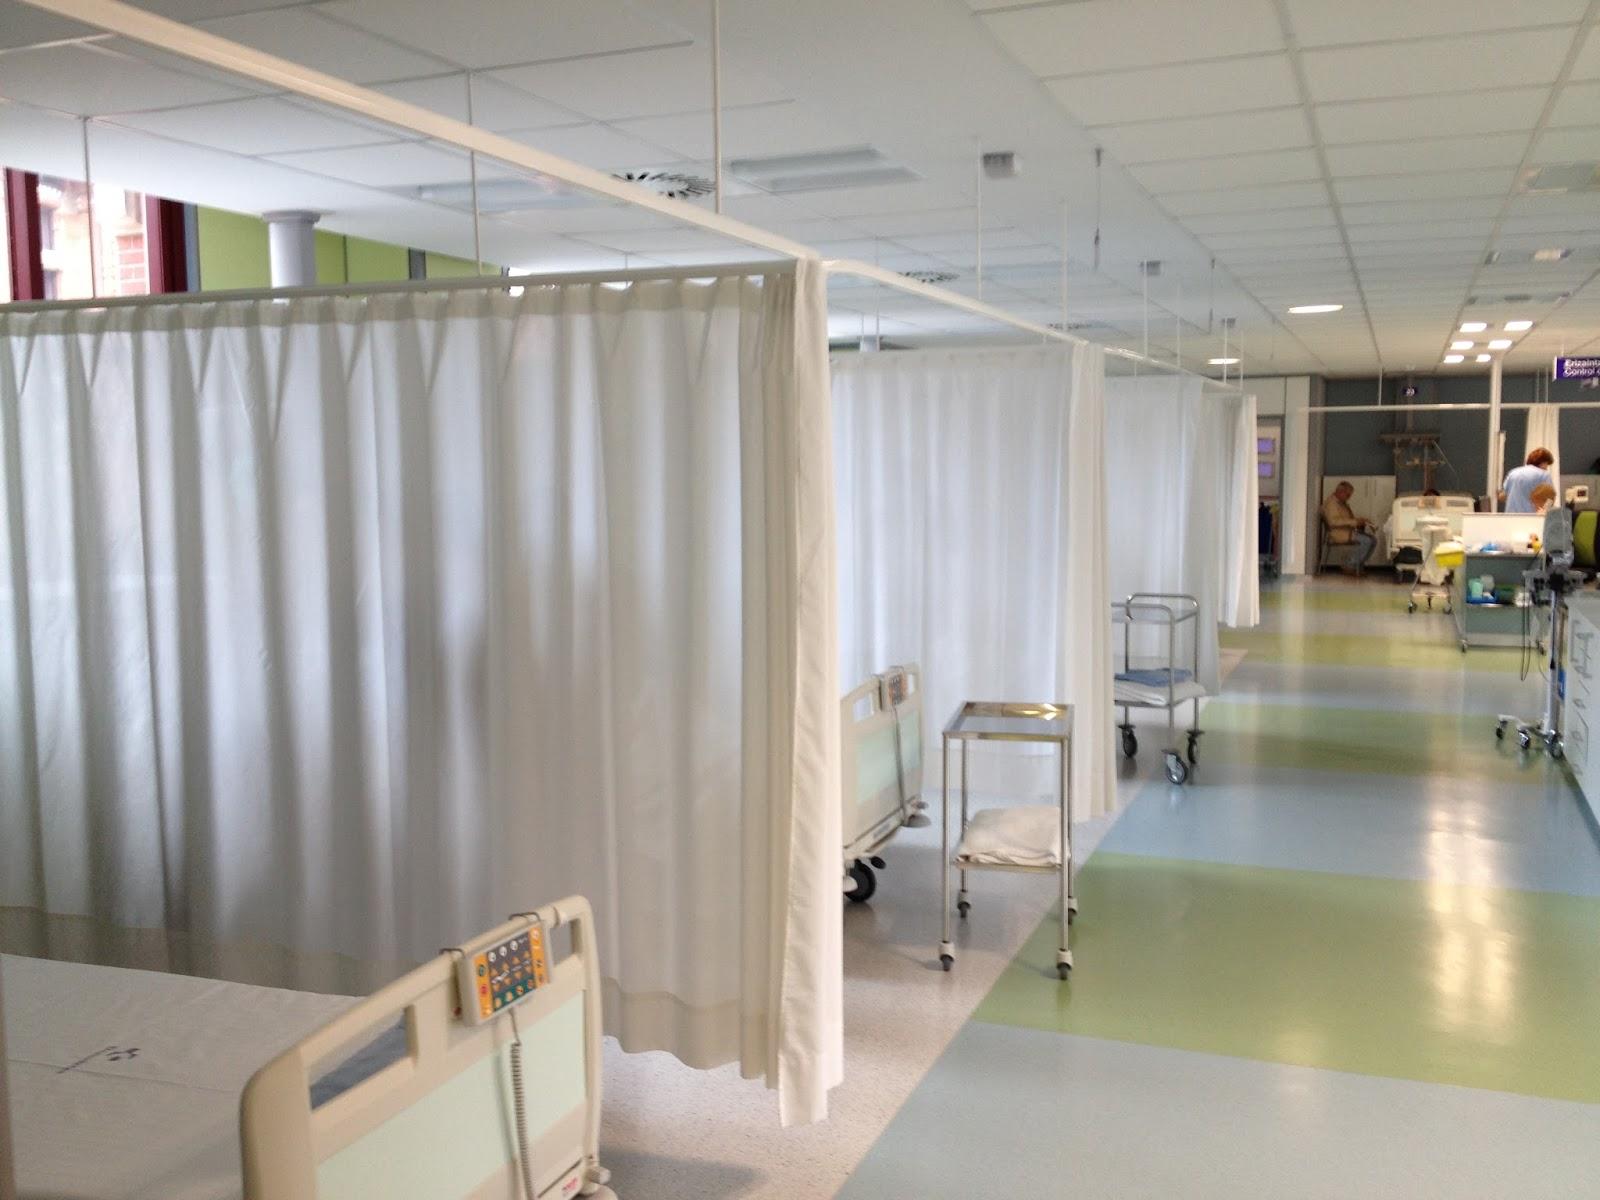 Lekune cortinas separadoras para hospitales o consultas for Rieles para toldos de techo